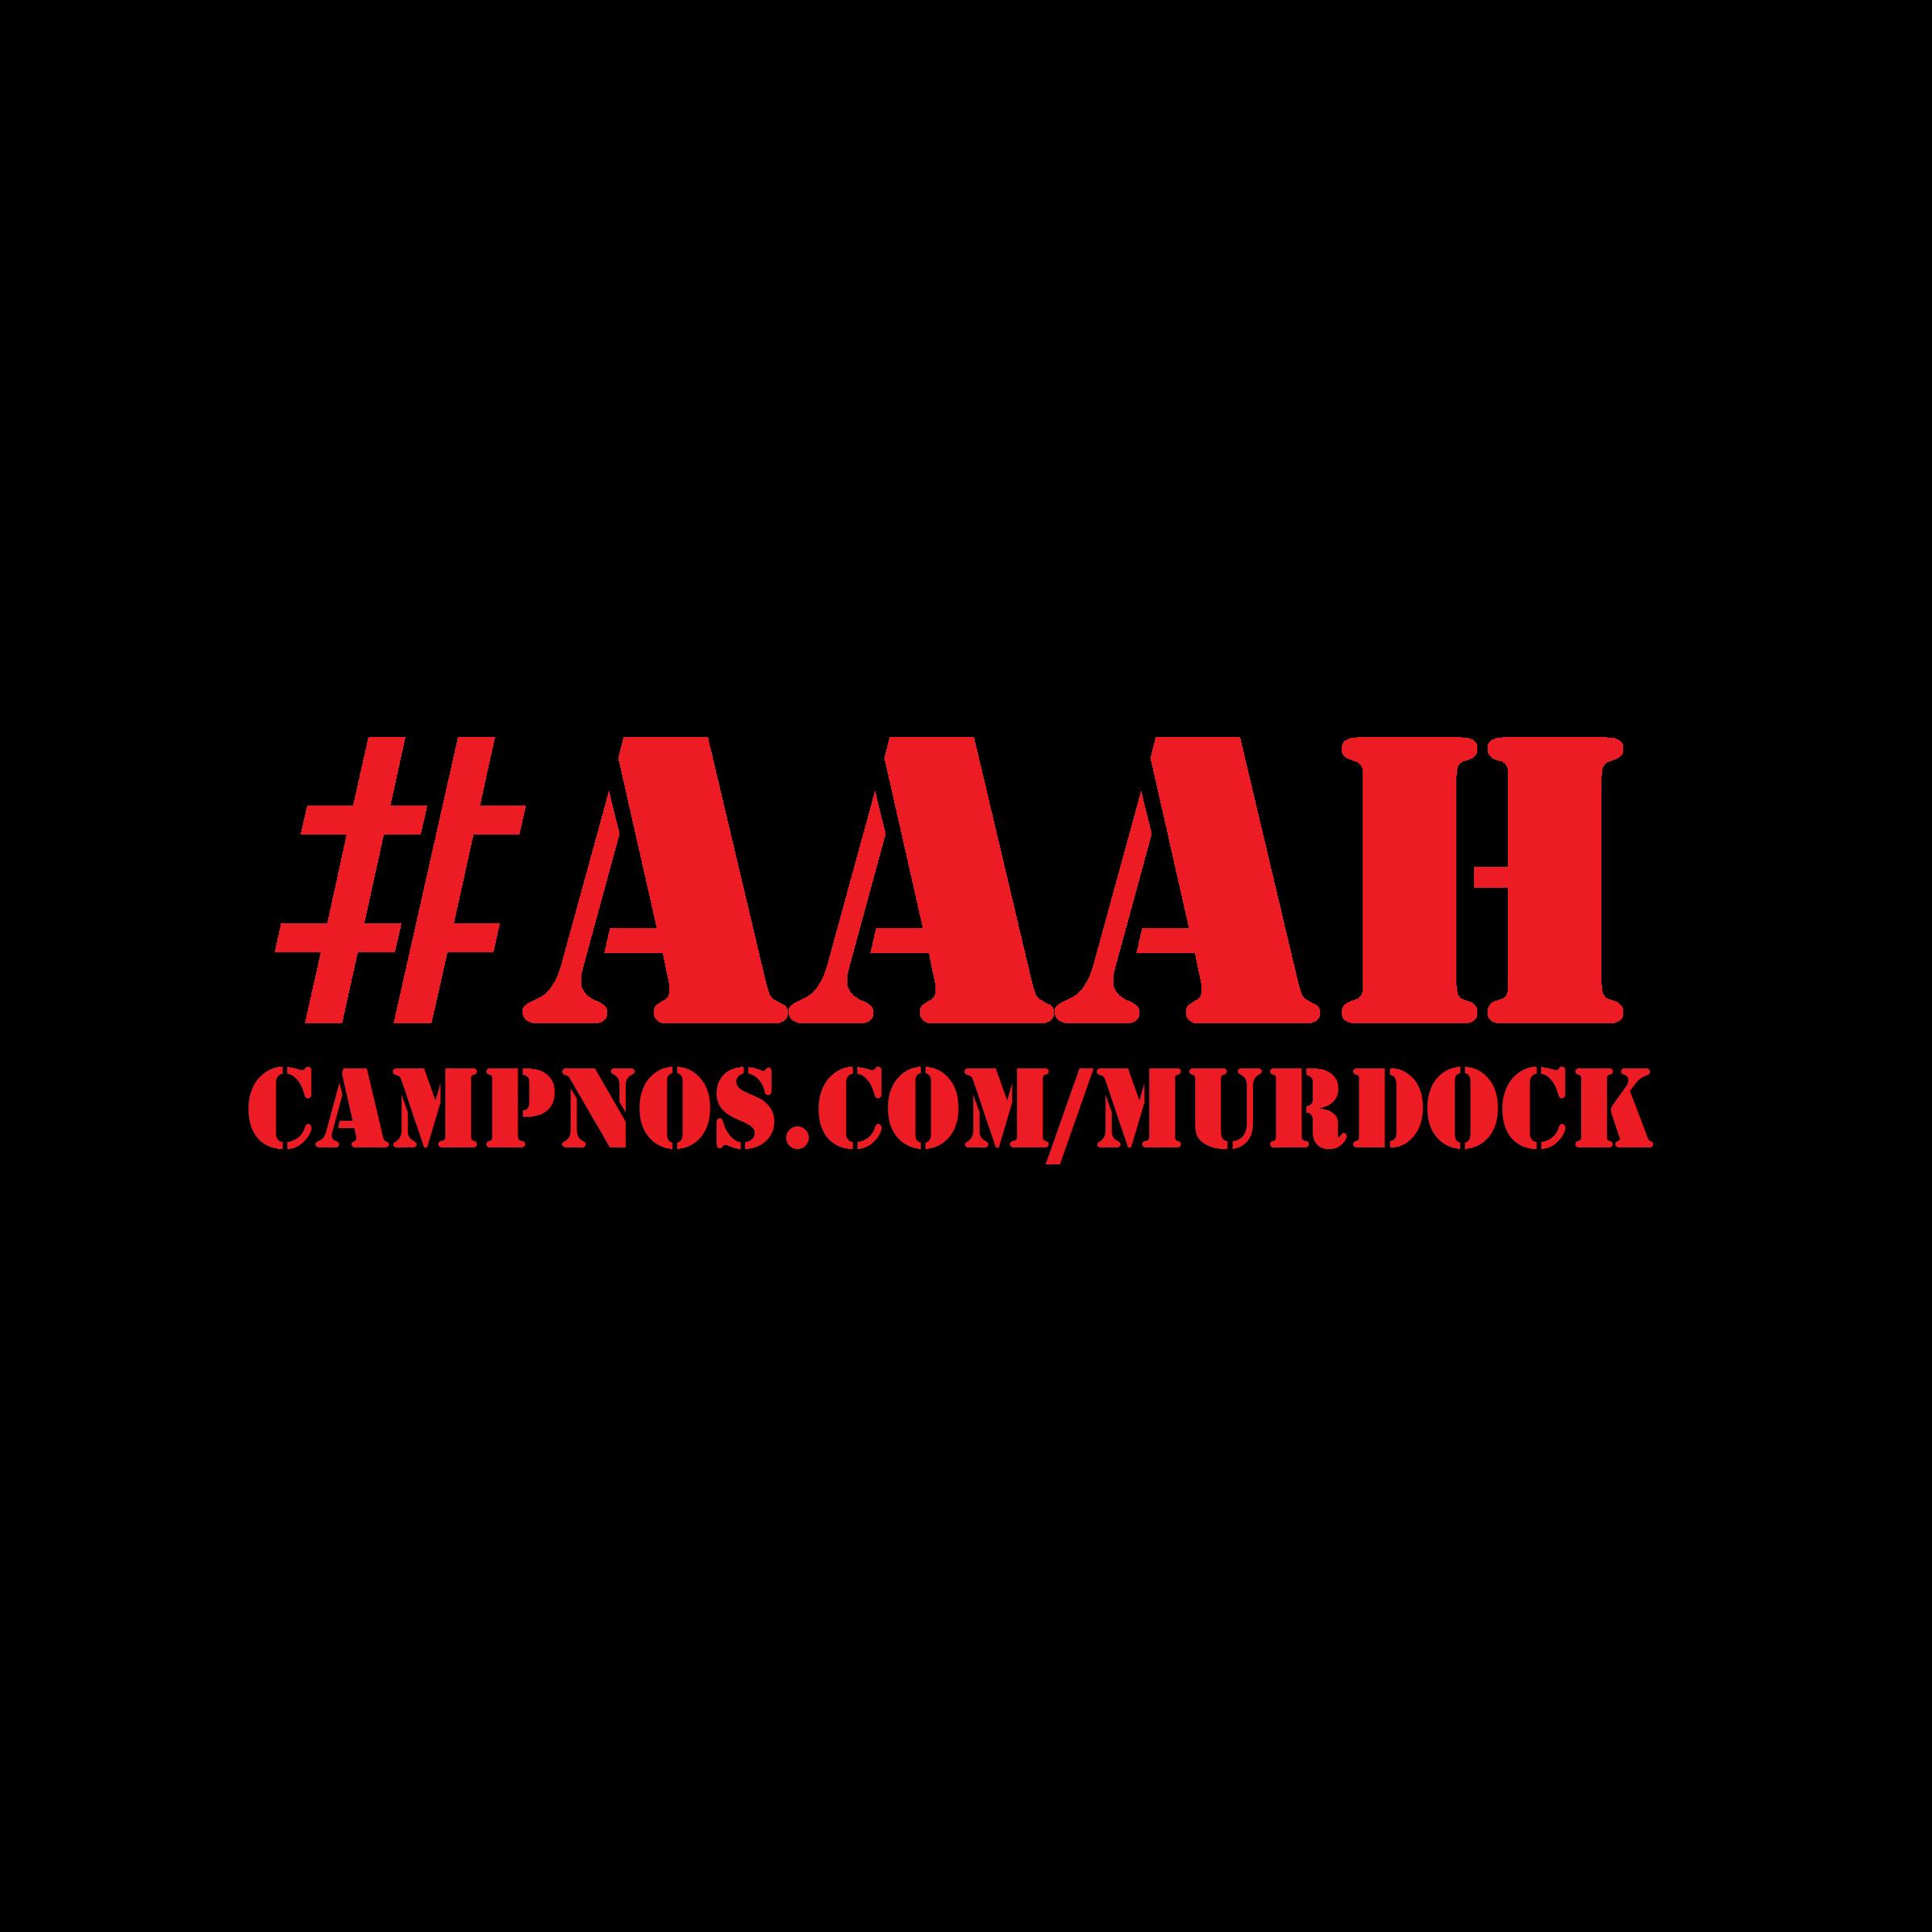 aaah album sticker logo cover.jpg